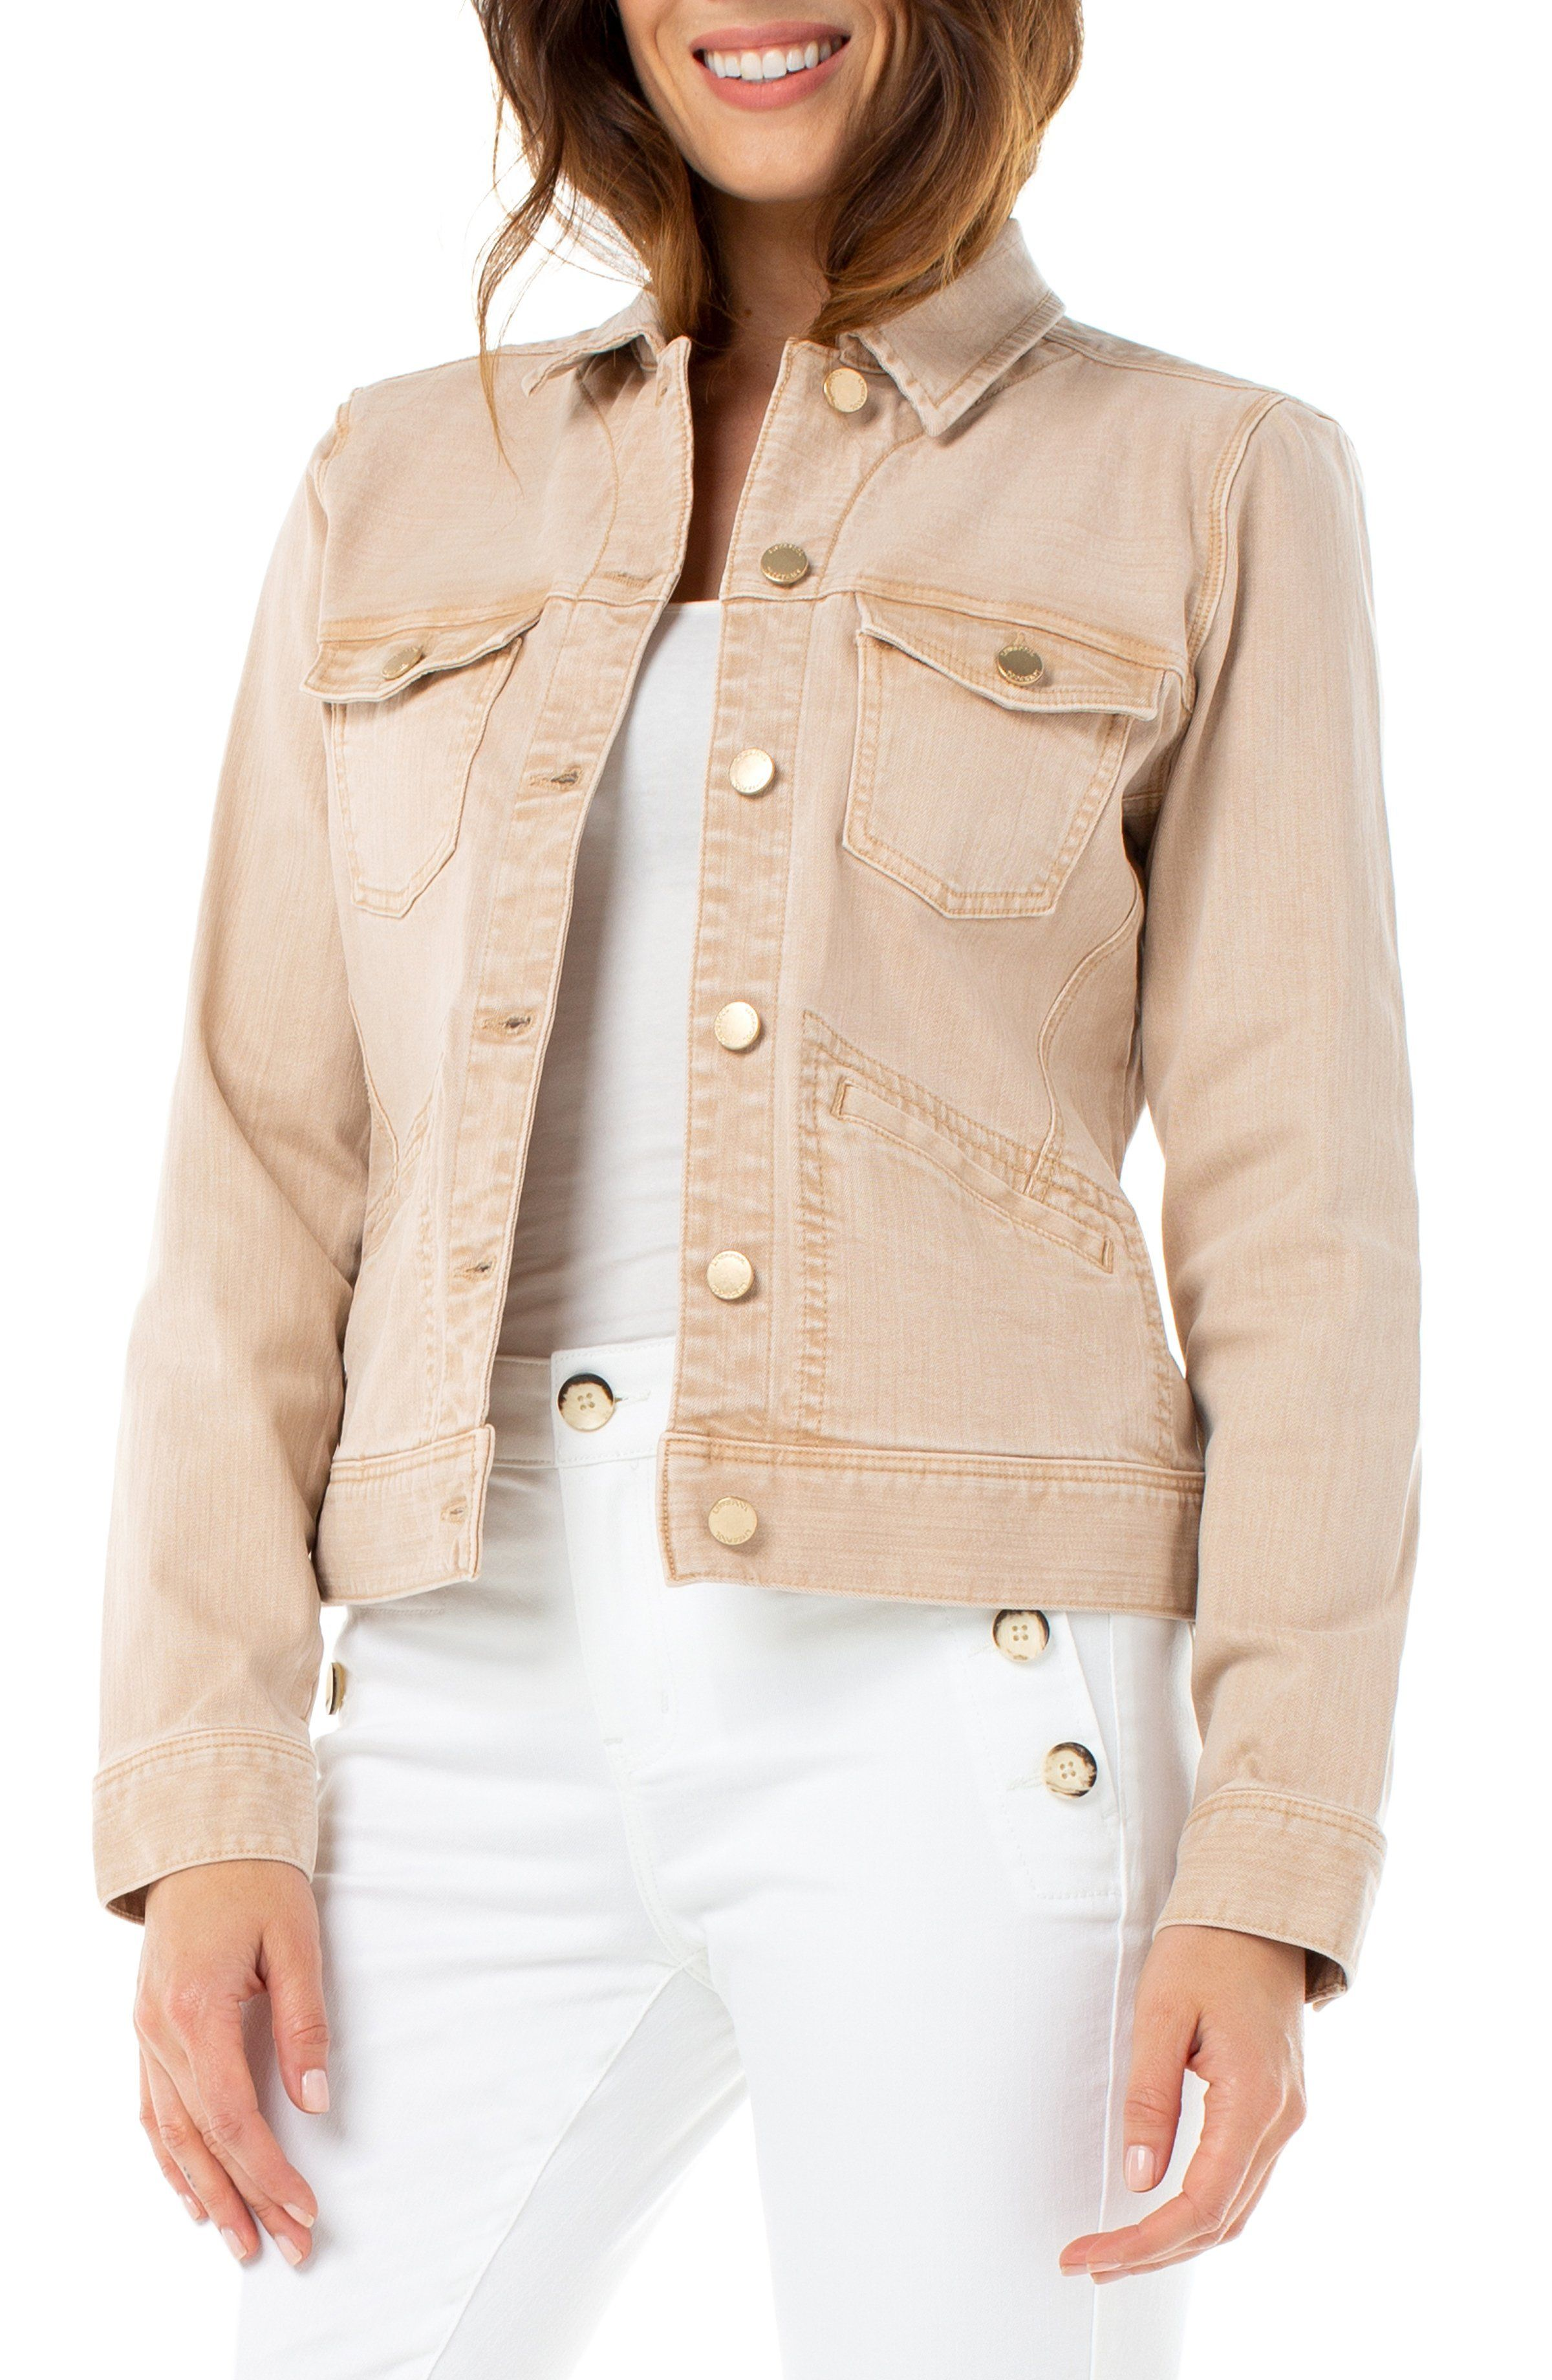 Classic Jean Jacket High Performance Denim Liverpool Los Angeles Jacket Outfit Women Jackets For Women Denim Jacket Women [ 3680 x 2400 Pixel ]